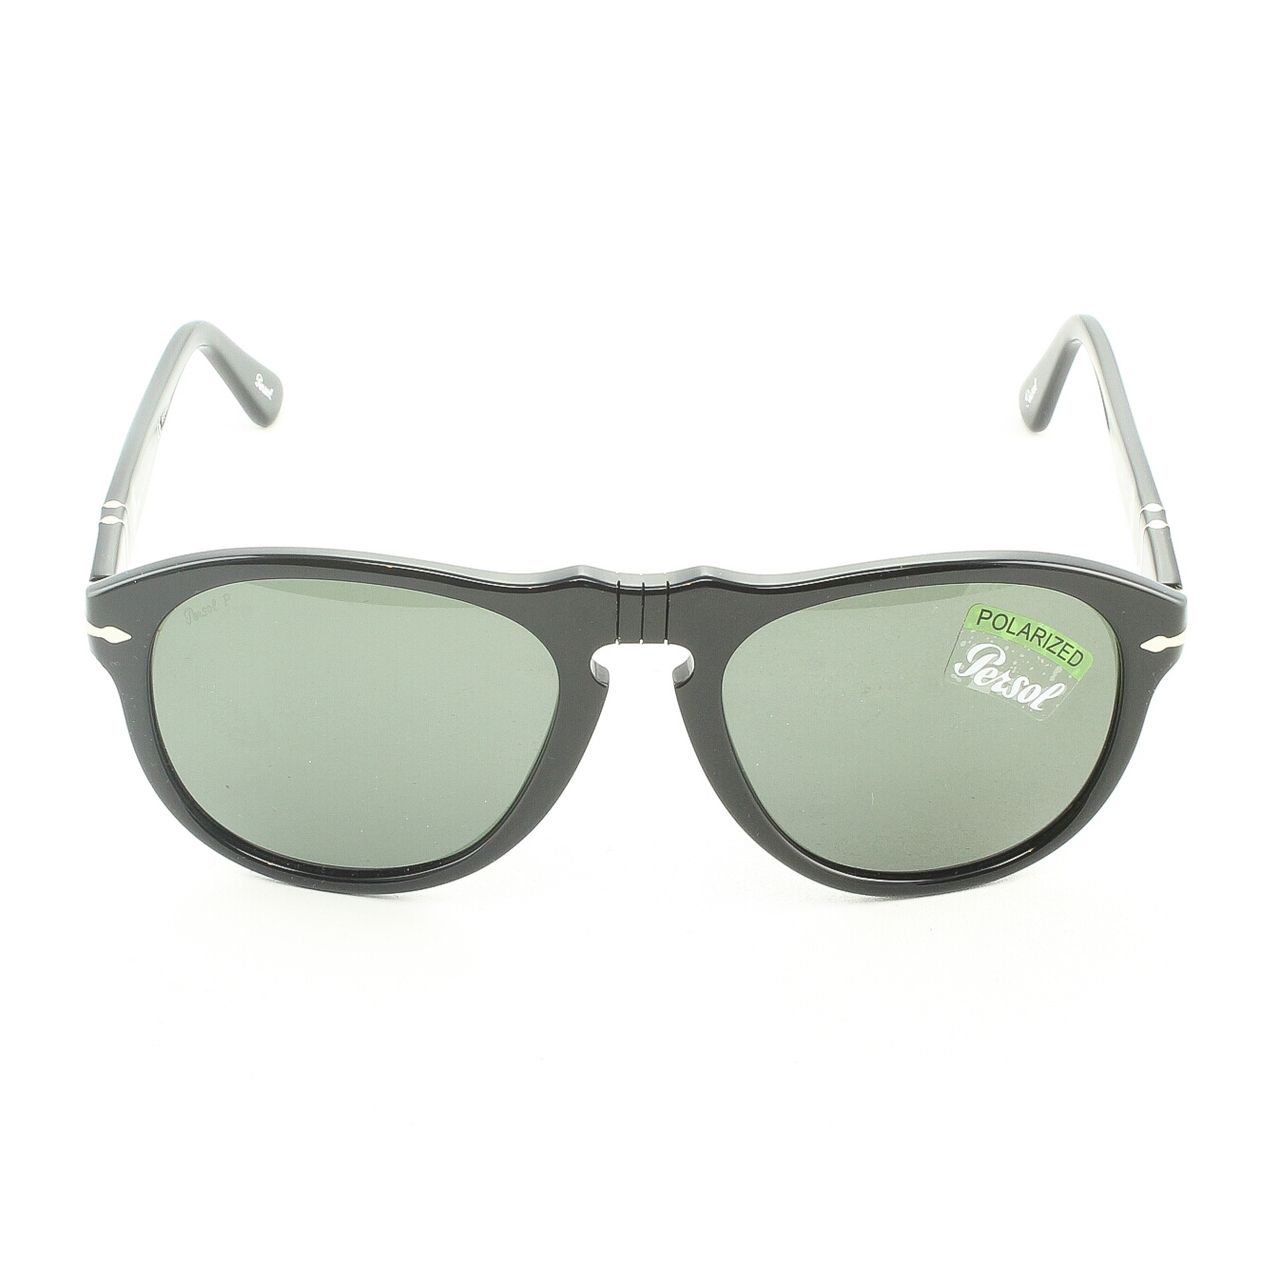 3d6f1e10b0d4 Persol PO0649 95/58 56mm Black Sunglasses with Grey Green Polarized Lenses  - Theaspecs.com